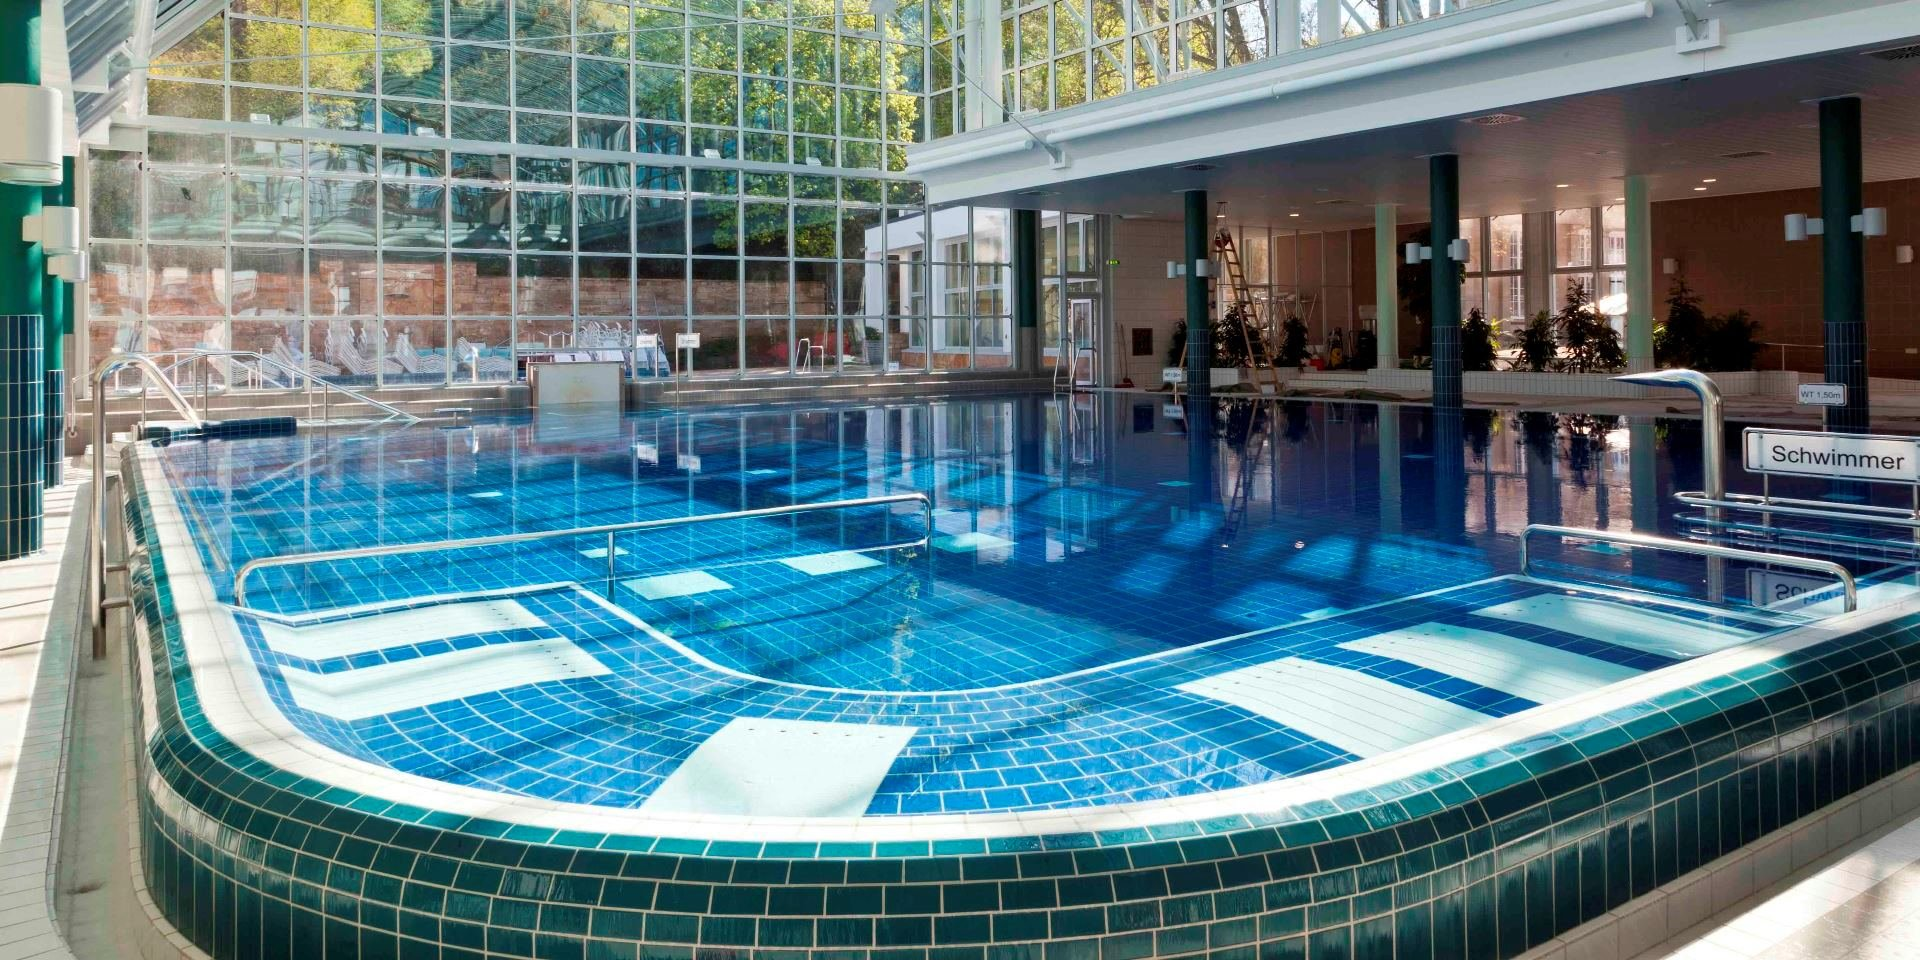 stuttgart mineralbad cannstatt steuler pool construction. Black Bedroom Furniture Sets. Home Design Ideas